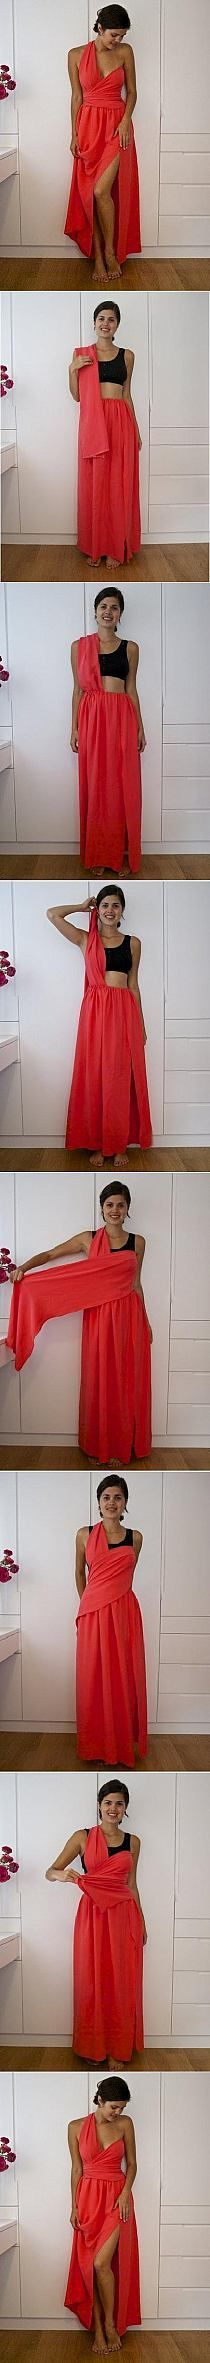 DIY No Sew Dress DIY Projects   UsefulDIY.com